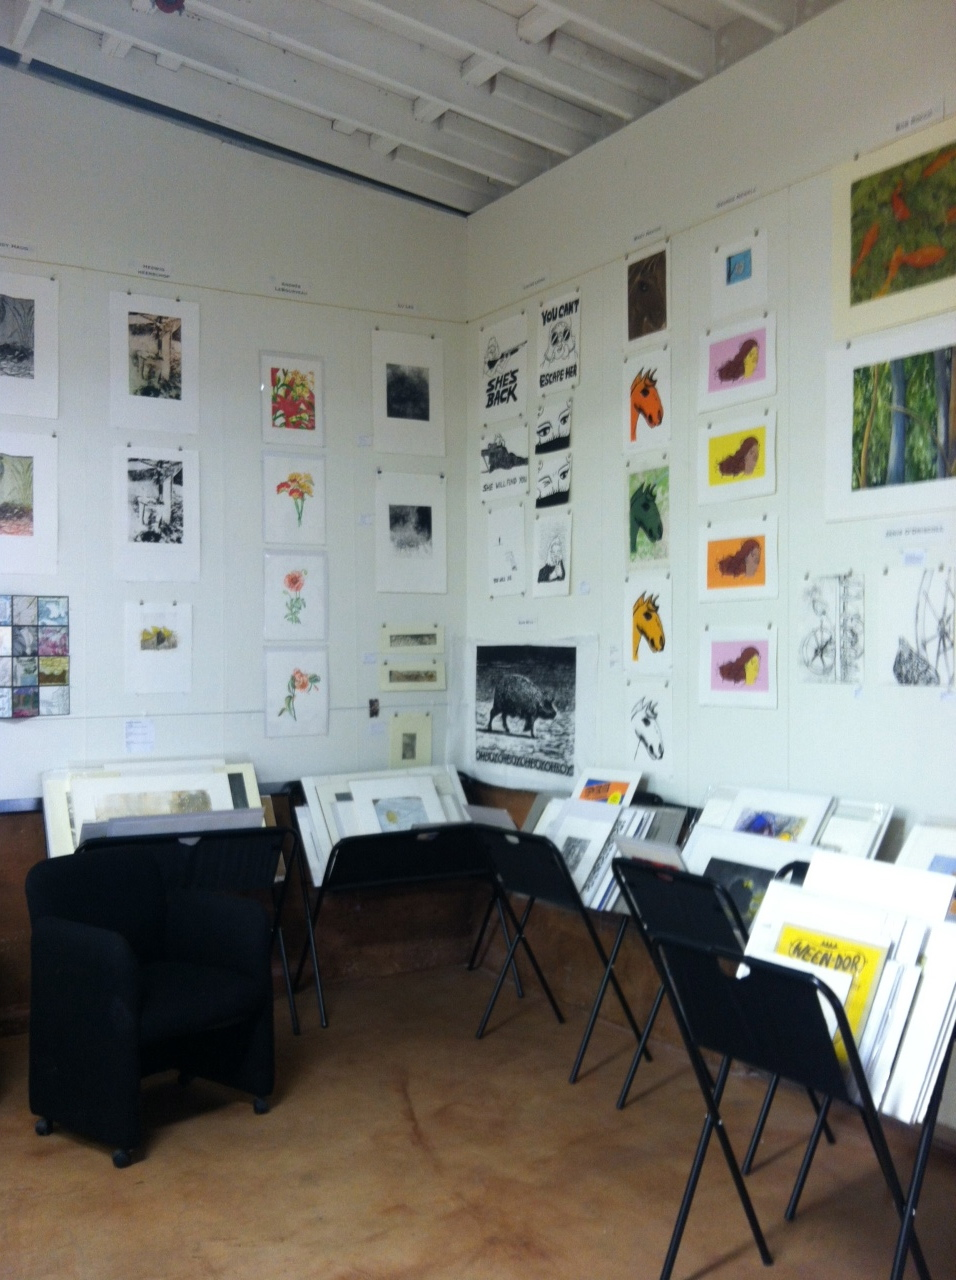 Inside view of the PATT studio.